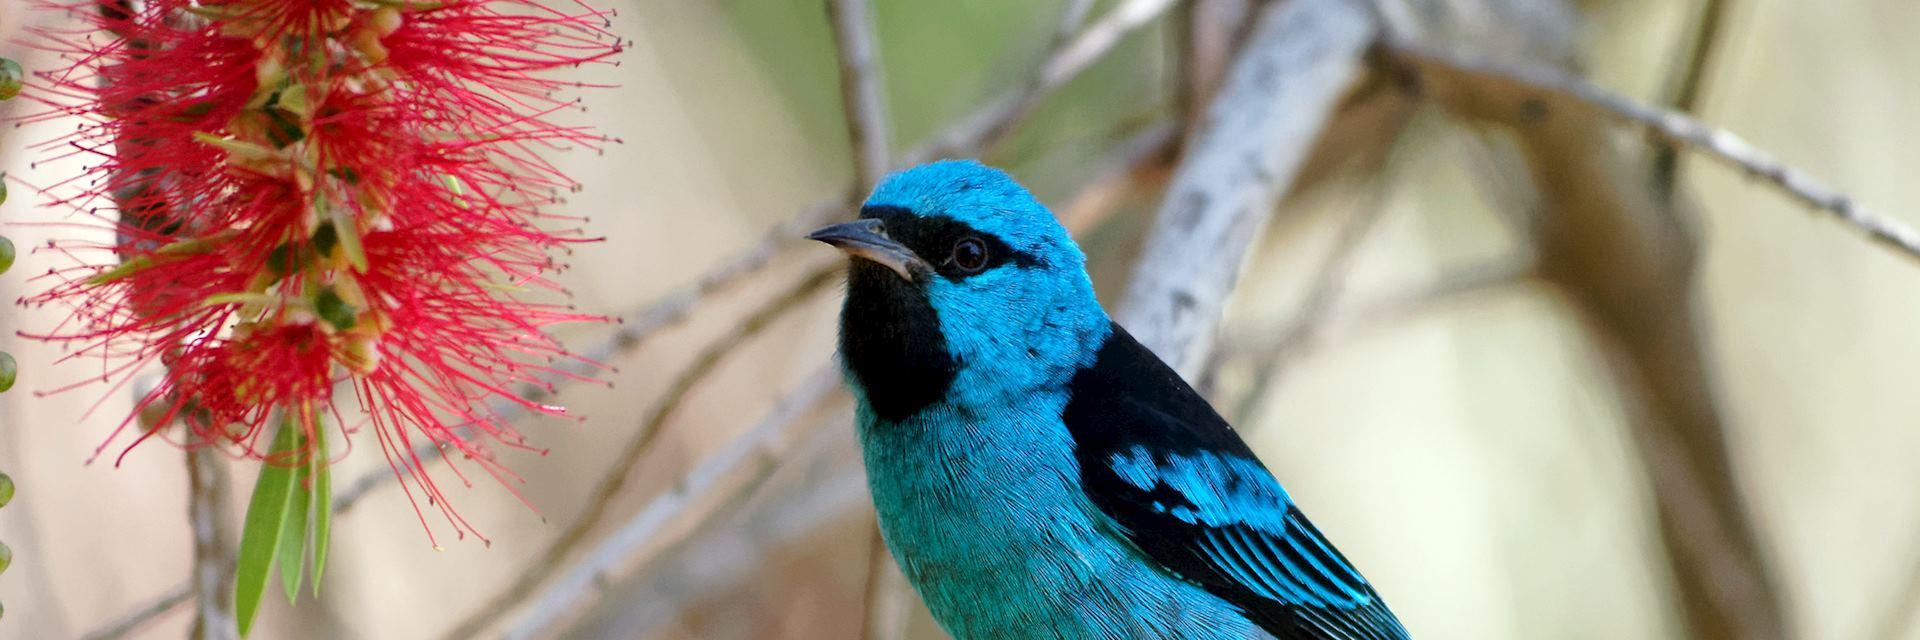 Blue dacnis on a bottlebrush tree, Nicaragua